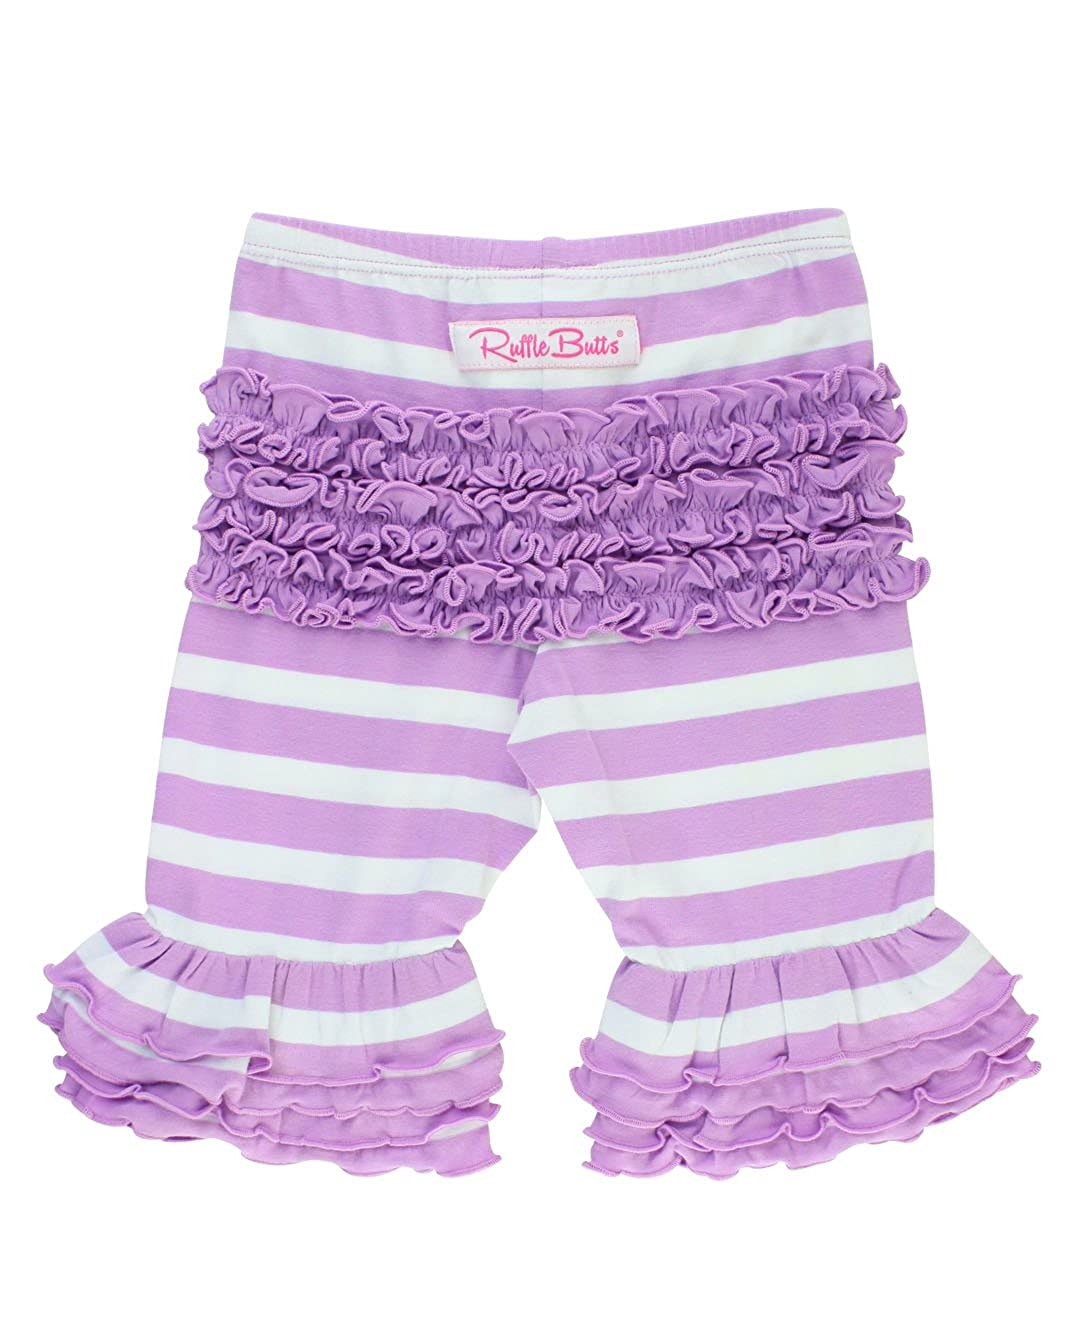 RuffleButts Baby/Toddler Girls Ruffled Bermuda Shorts GTKYYXX-0000-SC-BABY